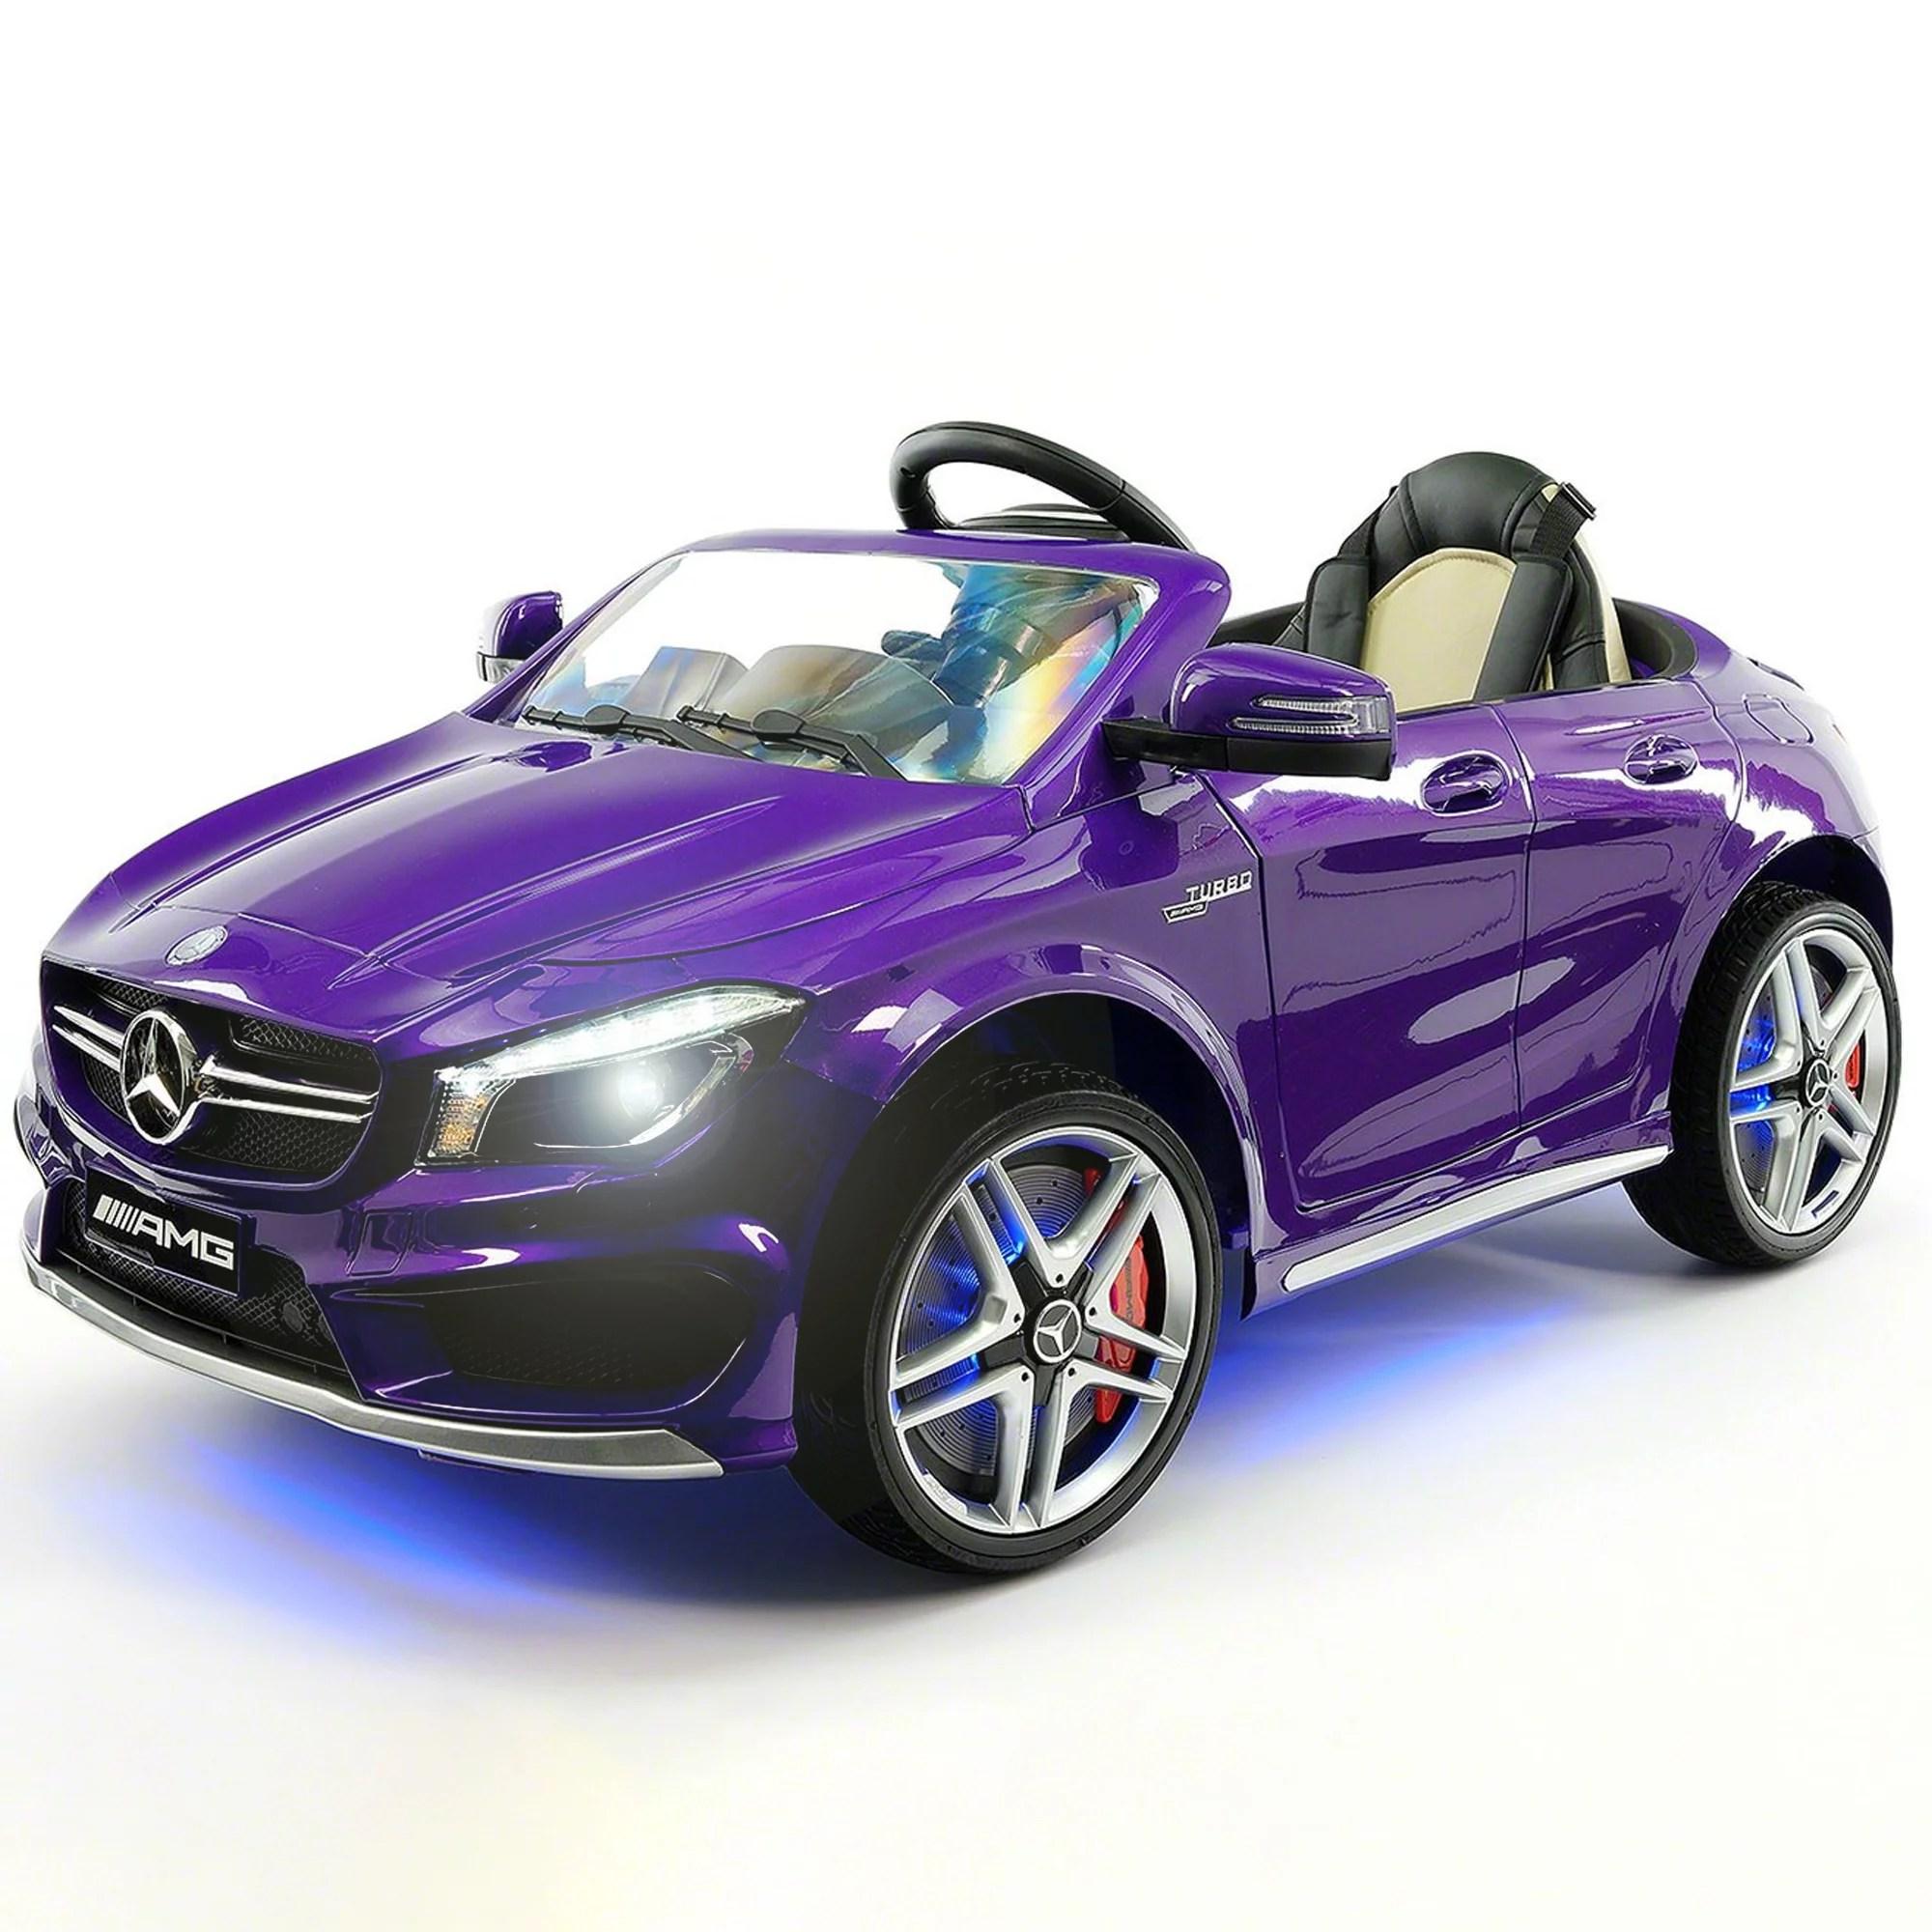 Mercedes Benz Cla 12v Ride On Car For Kids W Remote